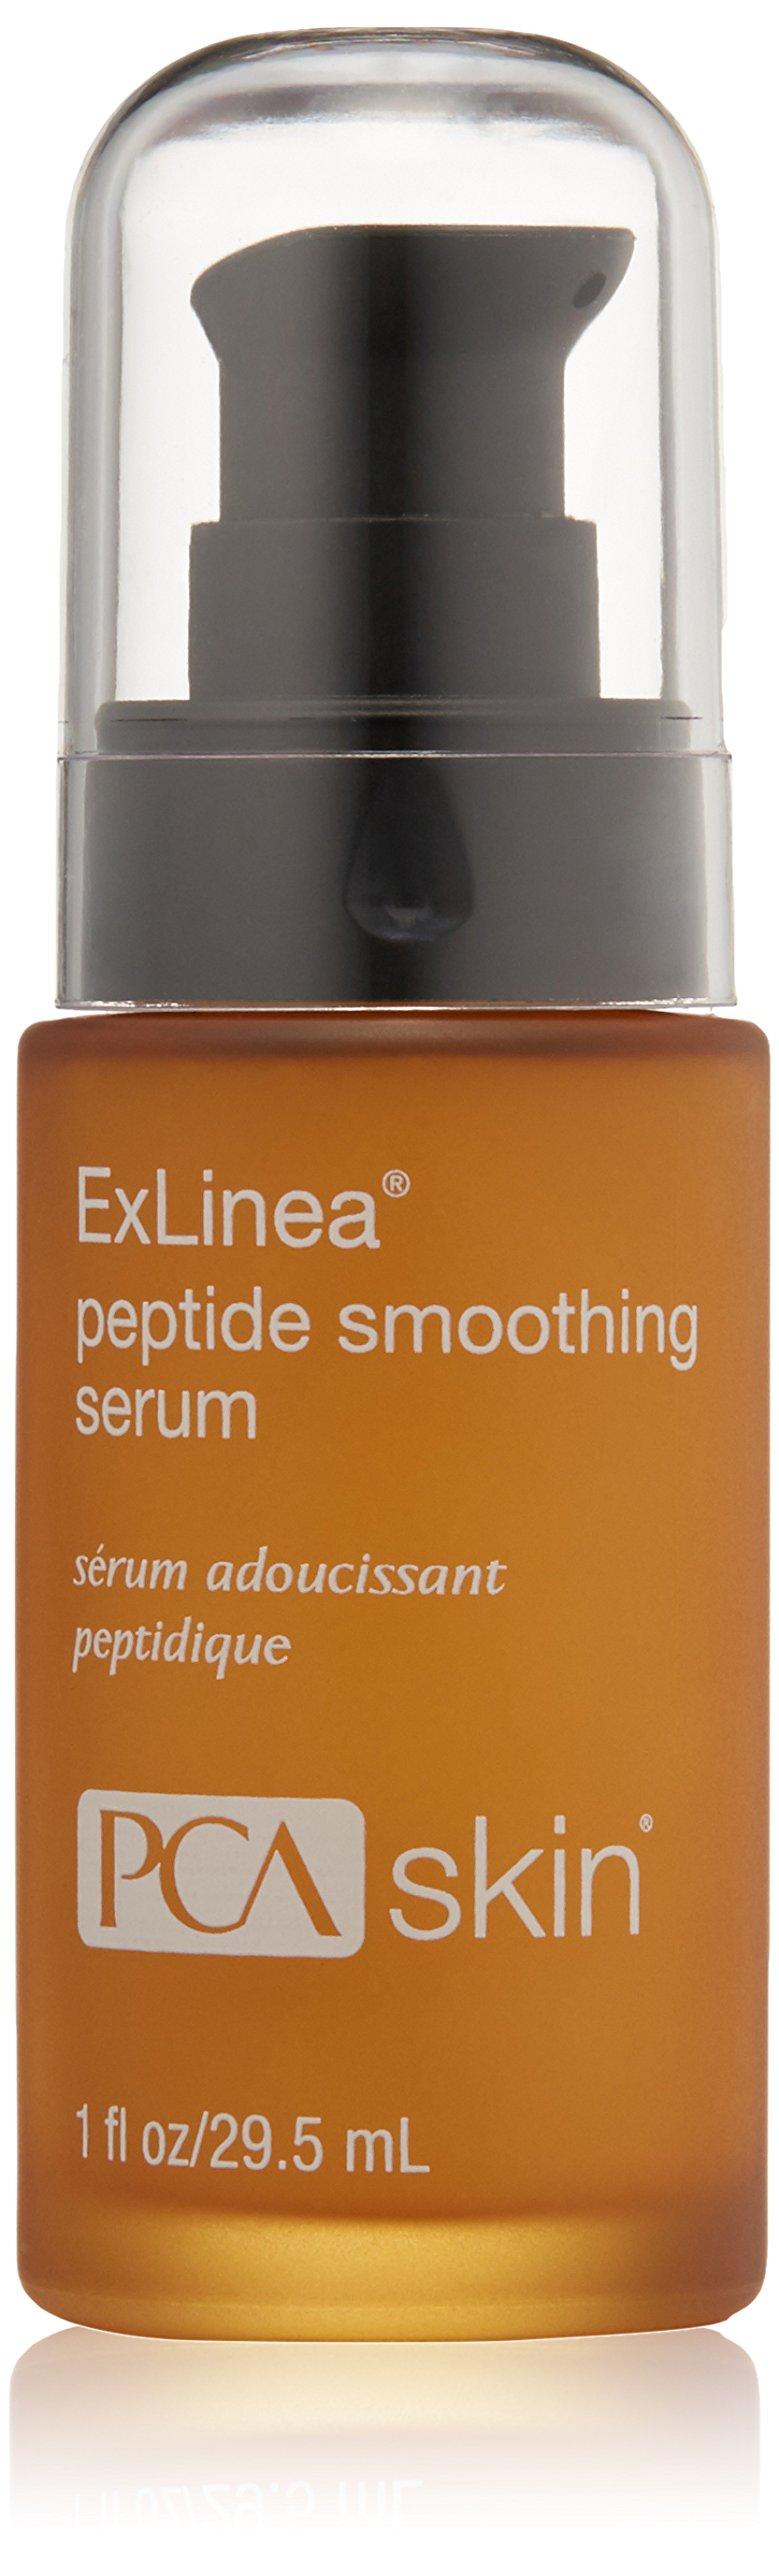 PCA SKIN Exlinea Peptide Smoothing Serum, 1 fl. oz. by PCA SKIN (Image #1)